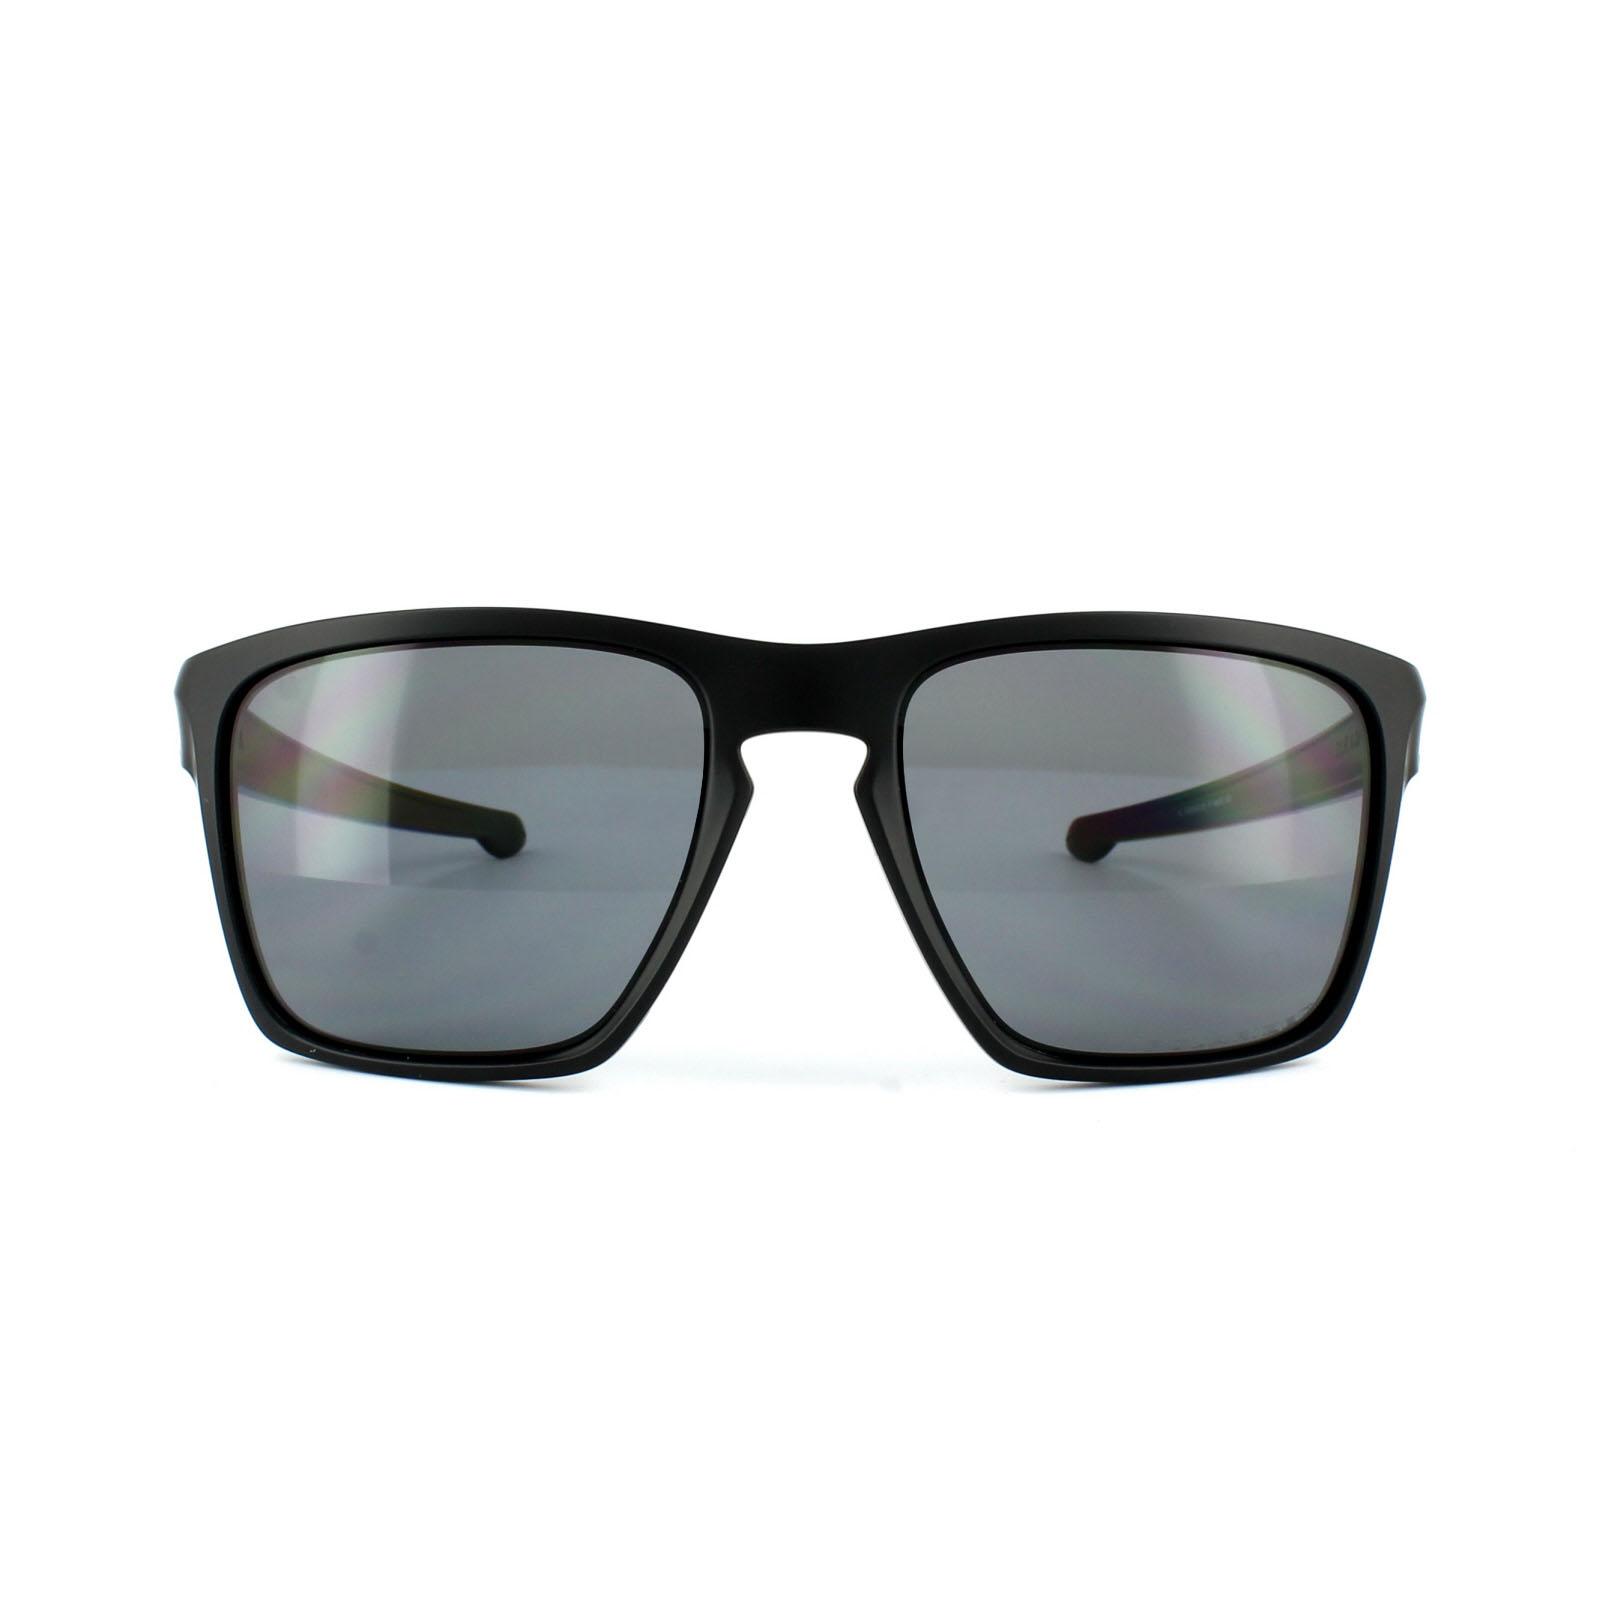 0e87d19126 Oakley Sliver XL Sunglasses Thumbnail 1 Oakley Sliver XL Sunglasses  Thumbnail 2 ...